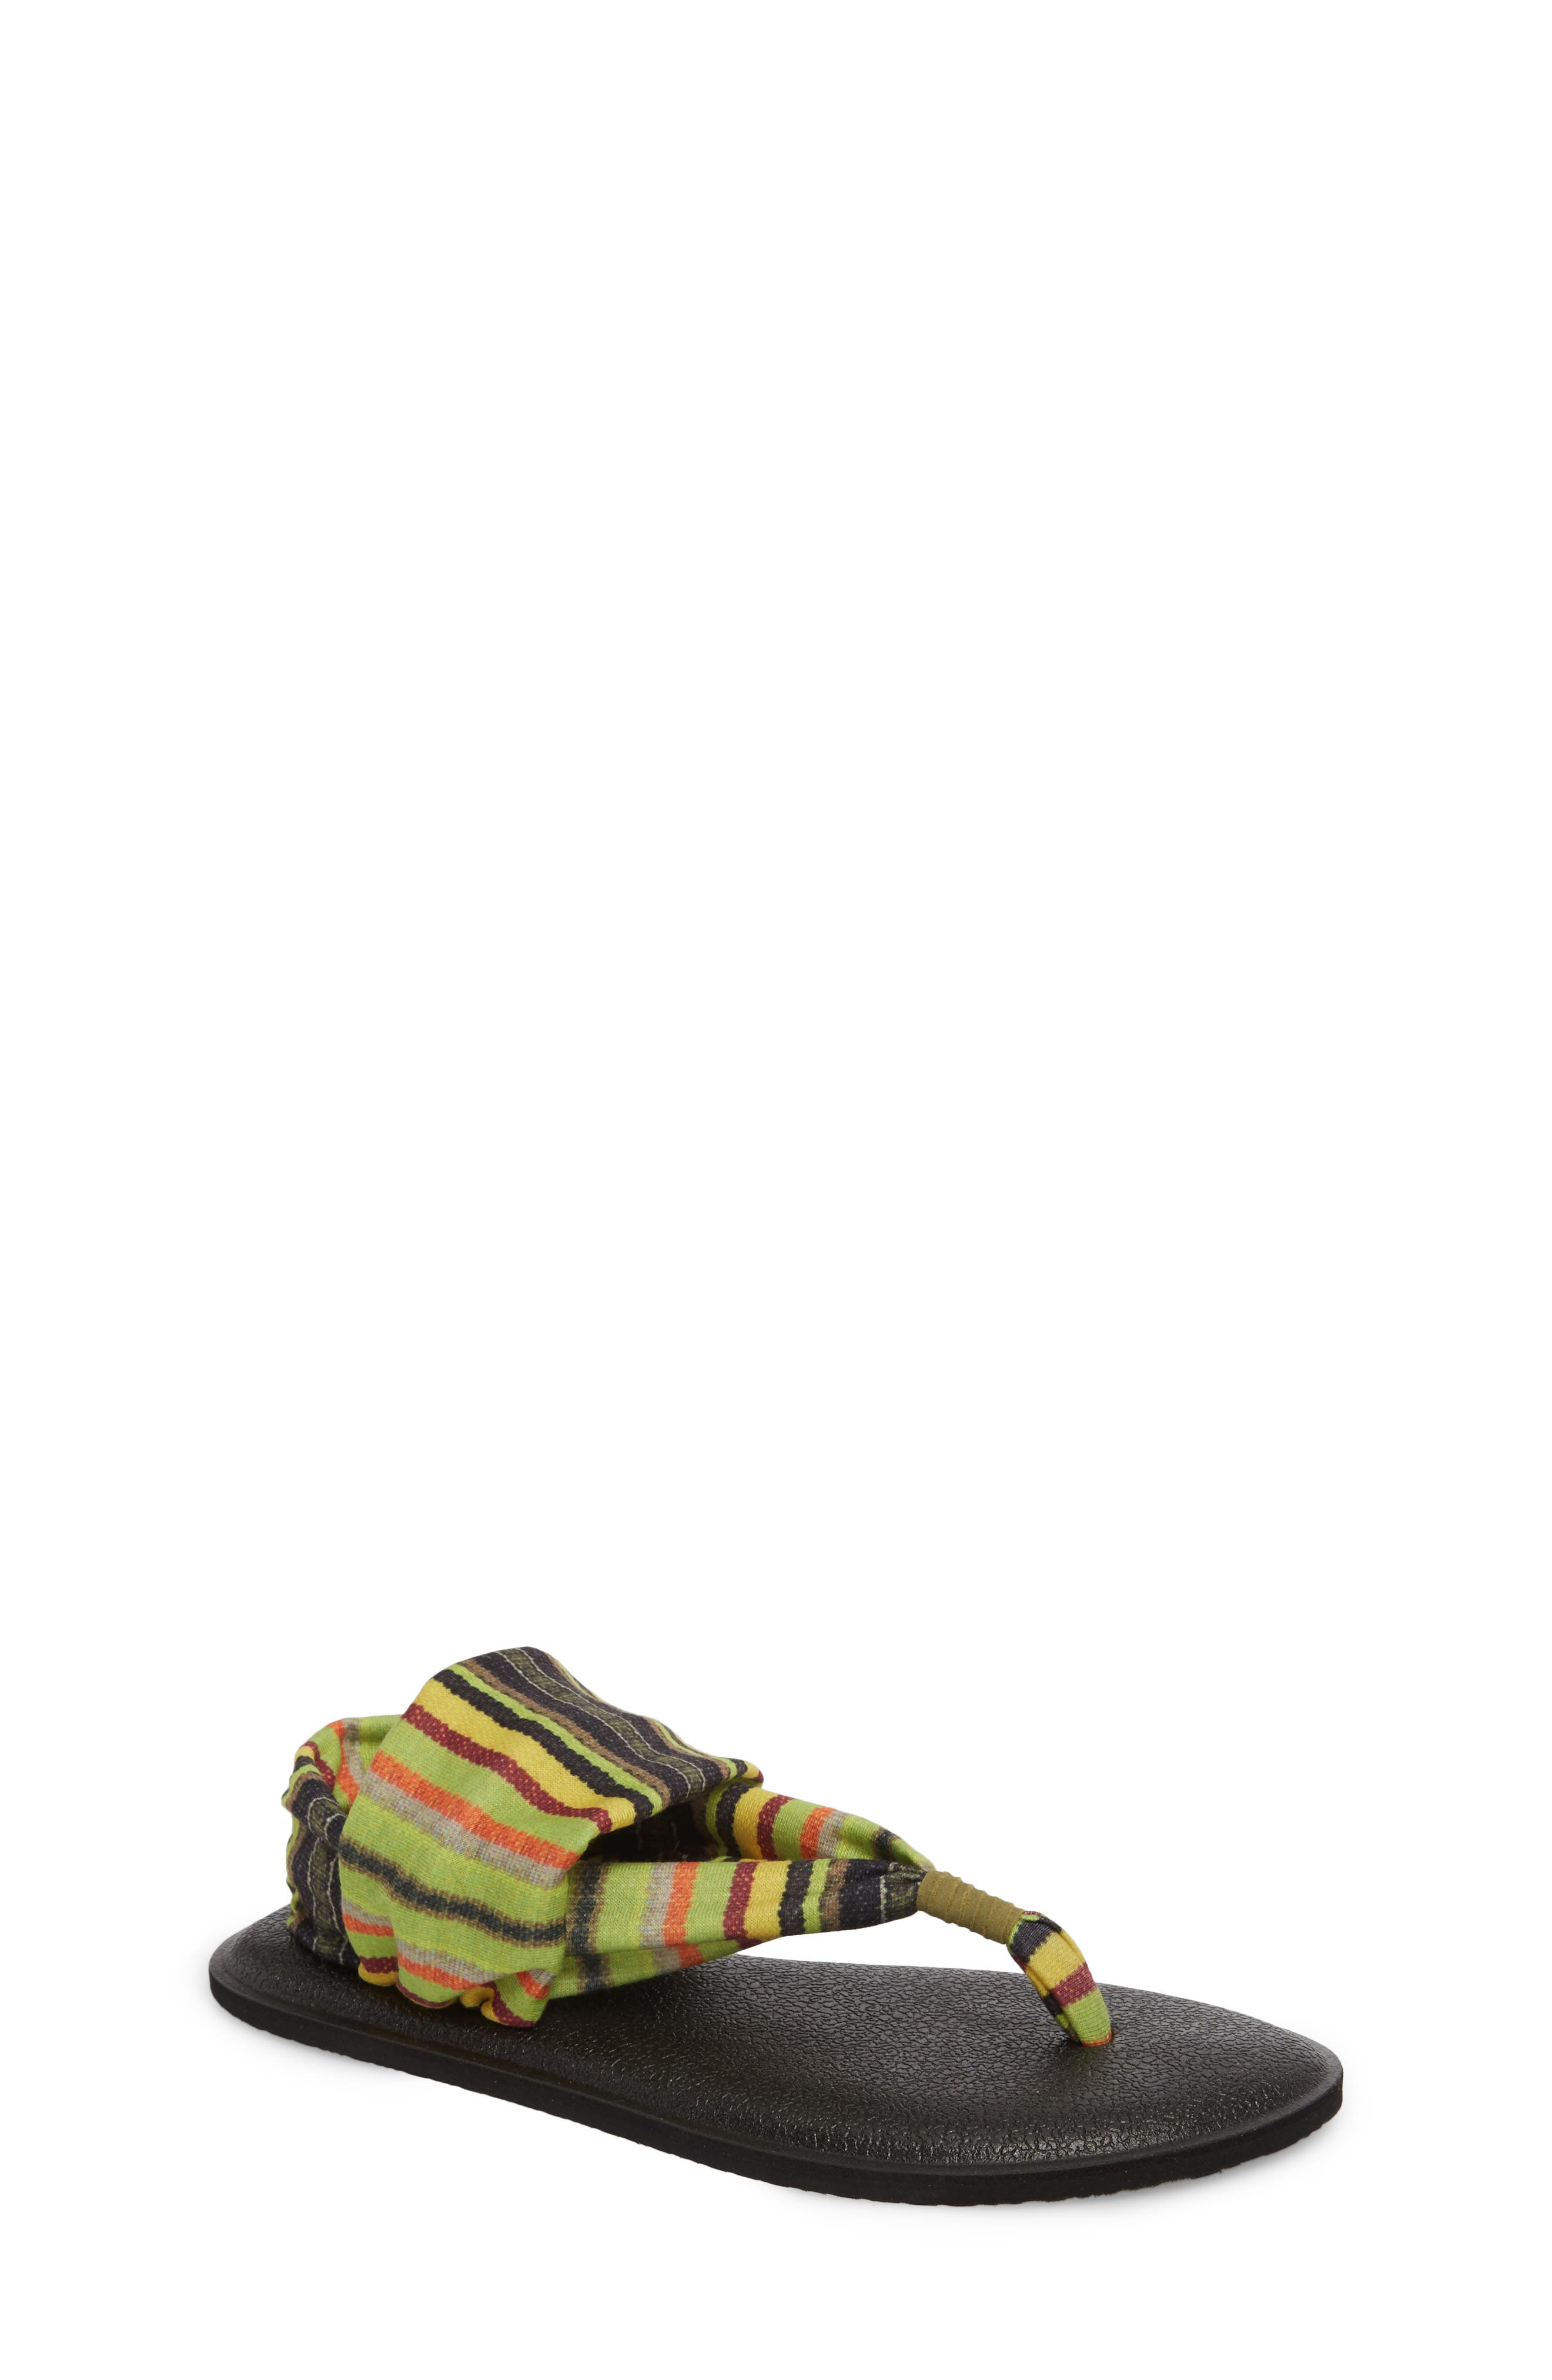 Yoga Sling Burst Sandal,                             Main thumbnail 1, color,                             GREEN KAUAI BLANKET